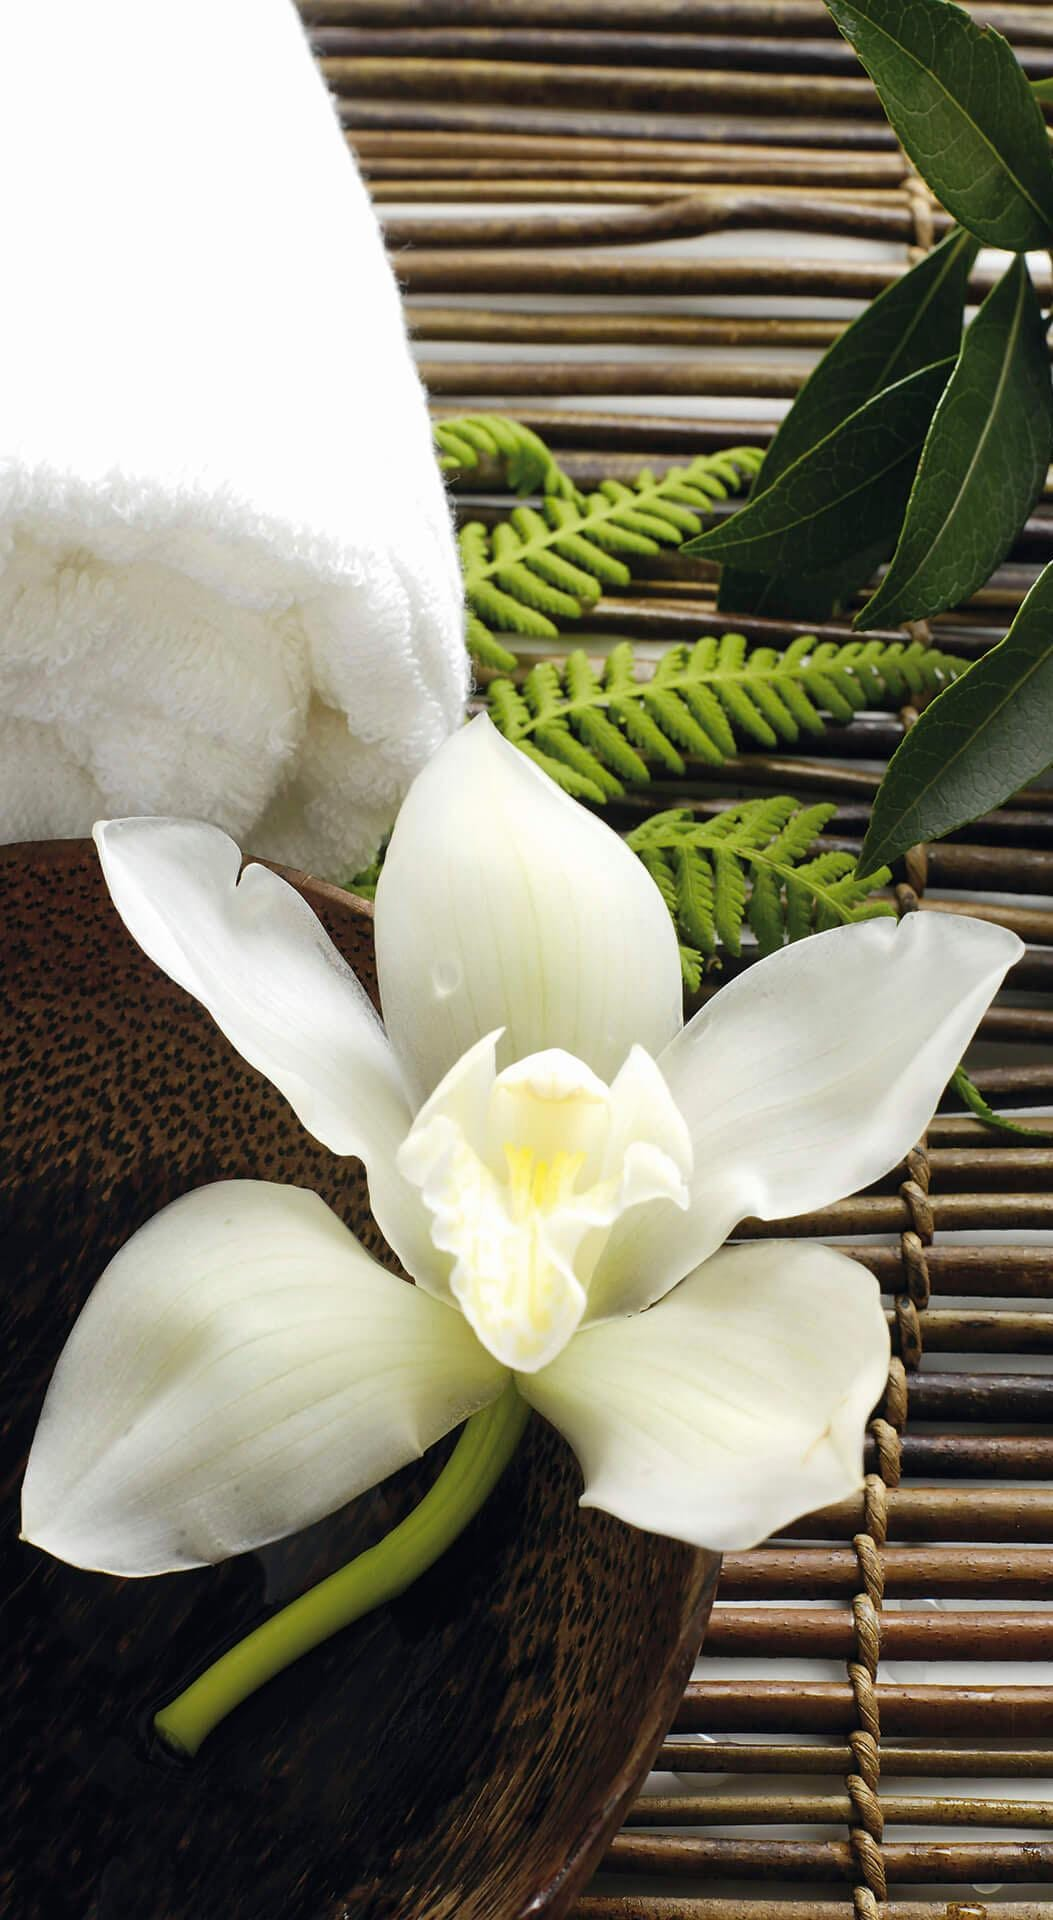 Vliestapete Wellness Orchidee Technik & Freizeit/Heimwerken & Garten/Bauen & Renovieren/Tapeten/Fototapeten/Fototapeten Blumen